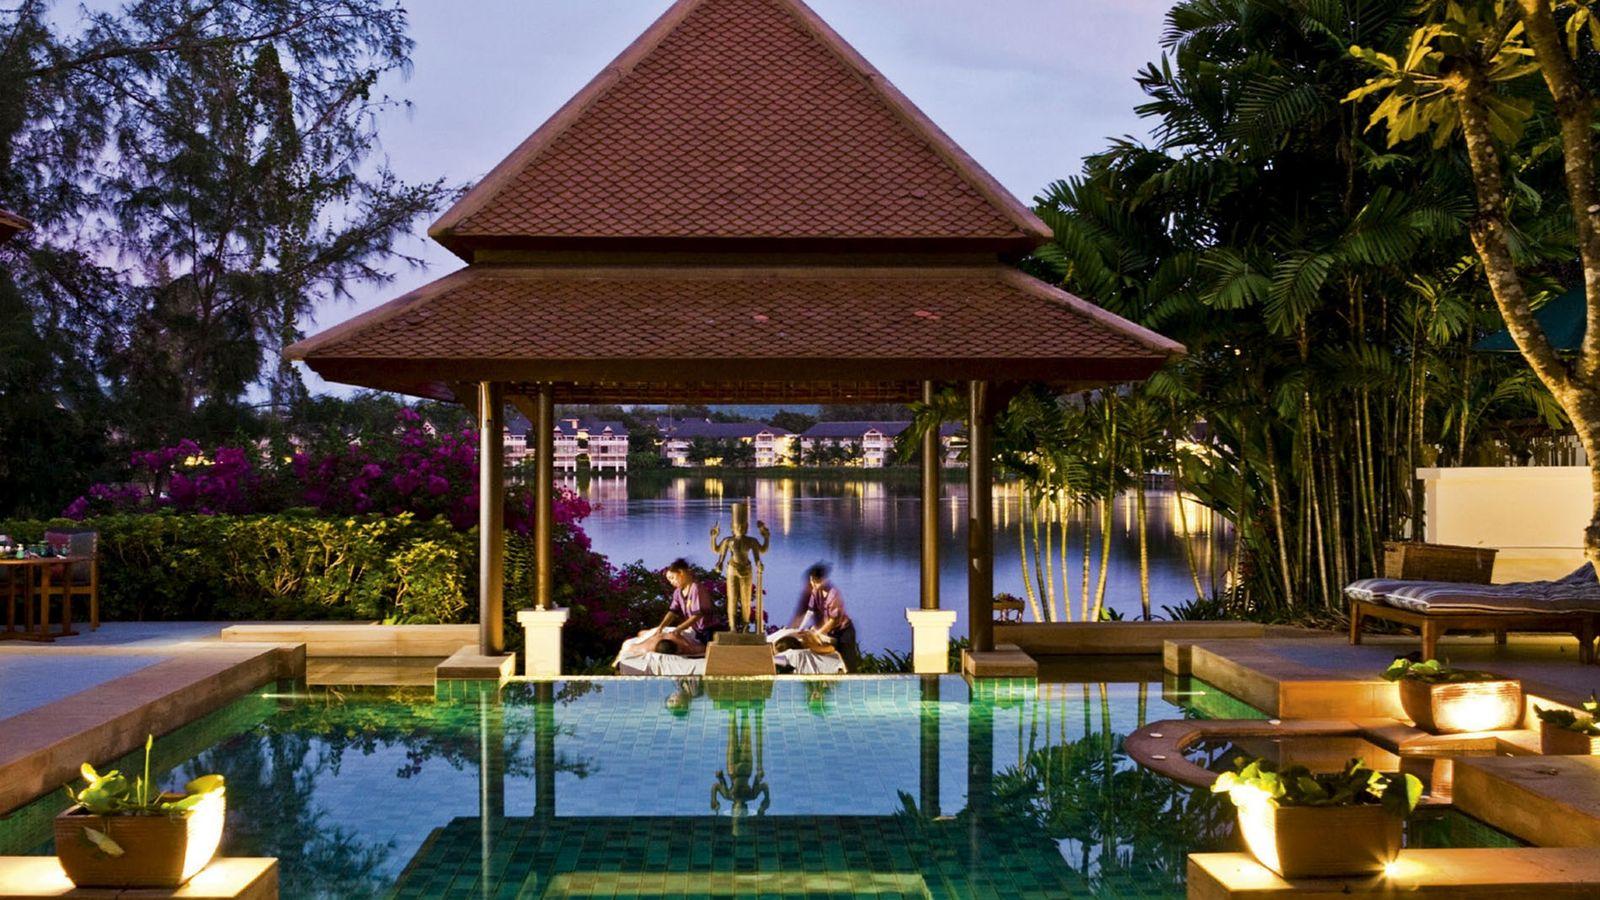 Outside massage area at Banyan Tree Spa Sanctuary